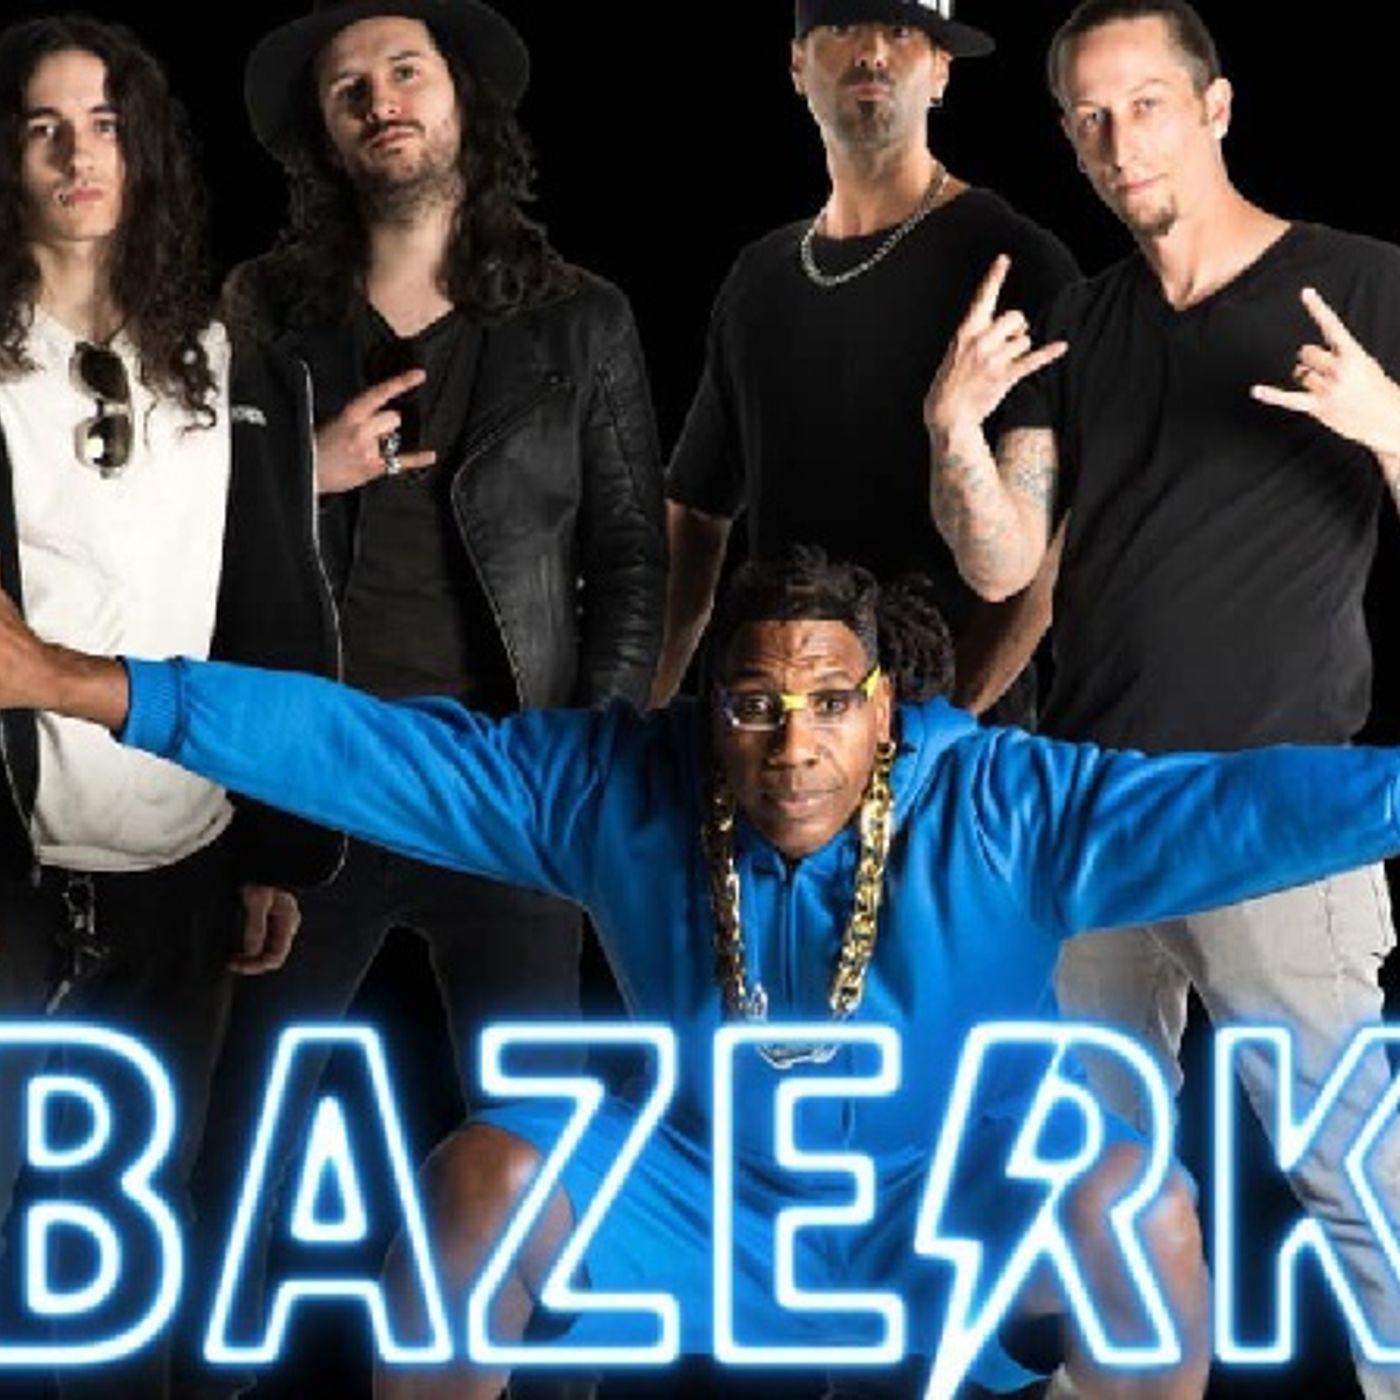 Bazerk on ITNS Radio